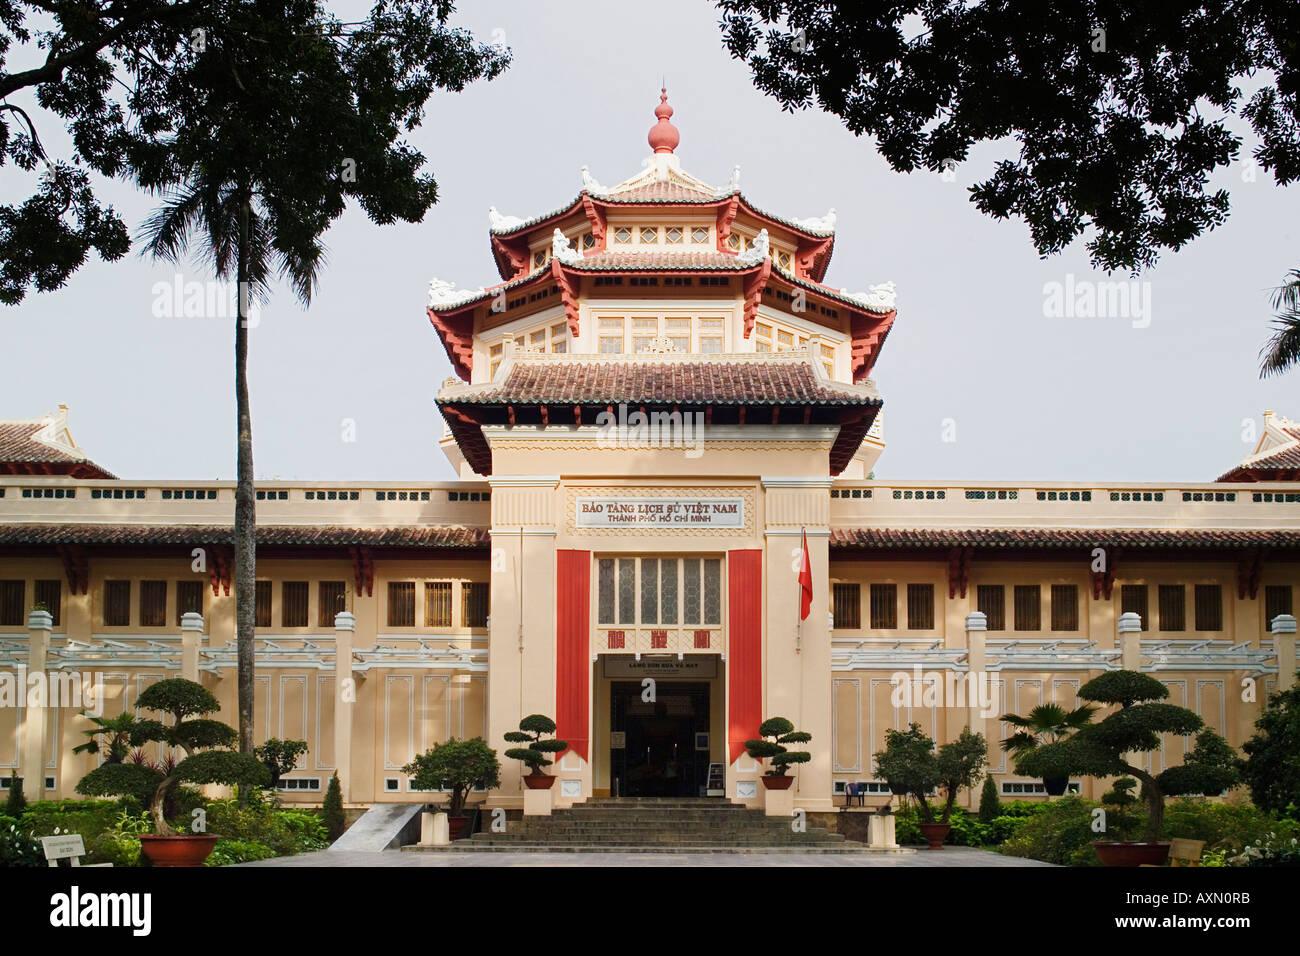 History Museum Ho Chi Minh City Saigon Vietnam Stock Photo